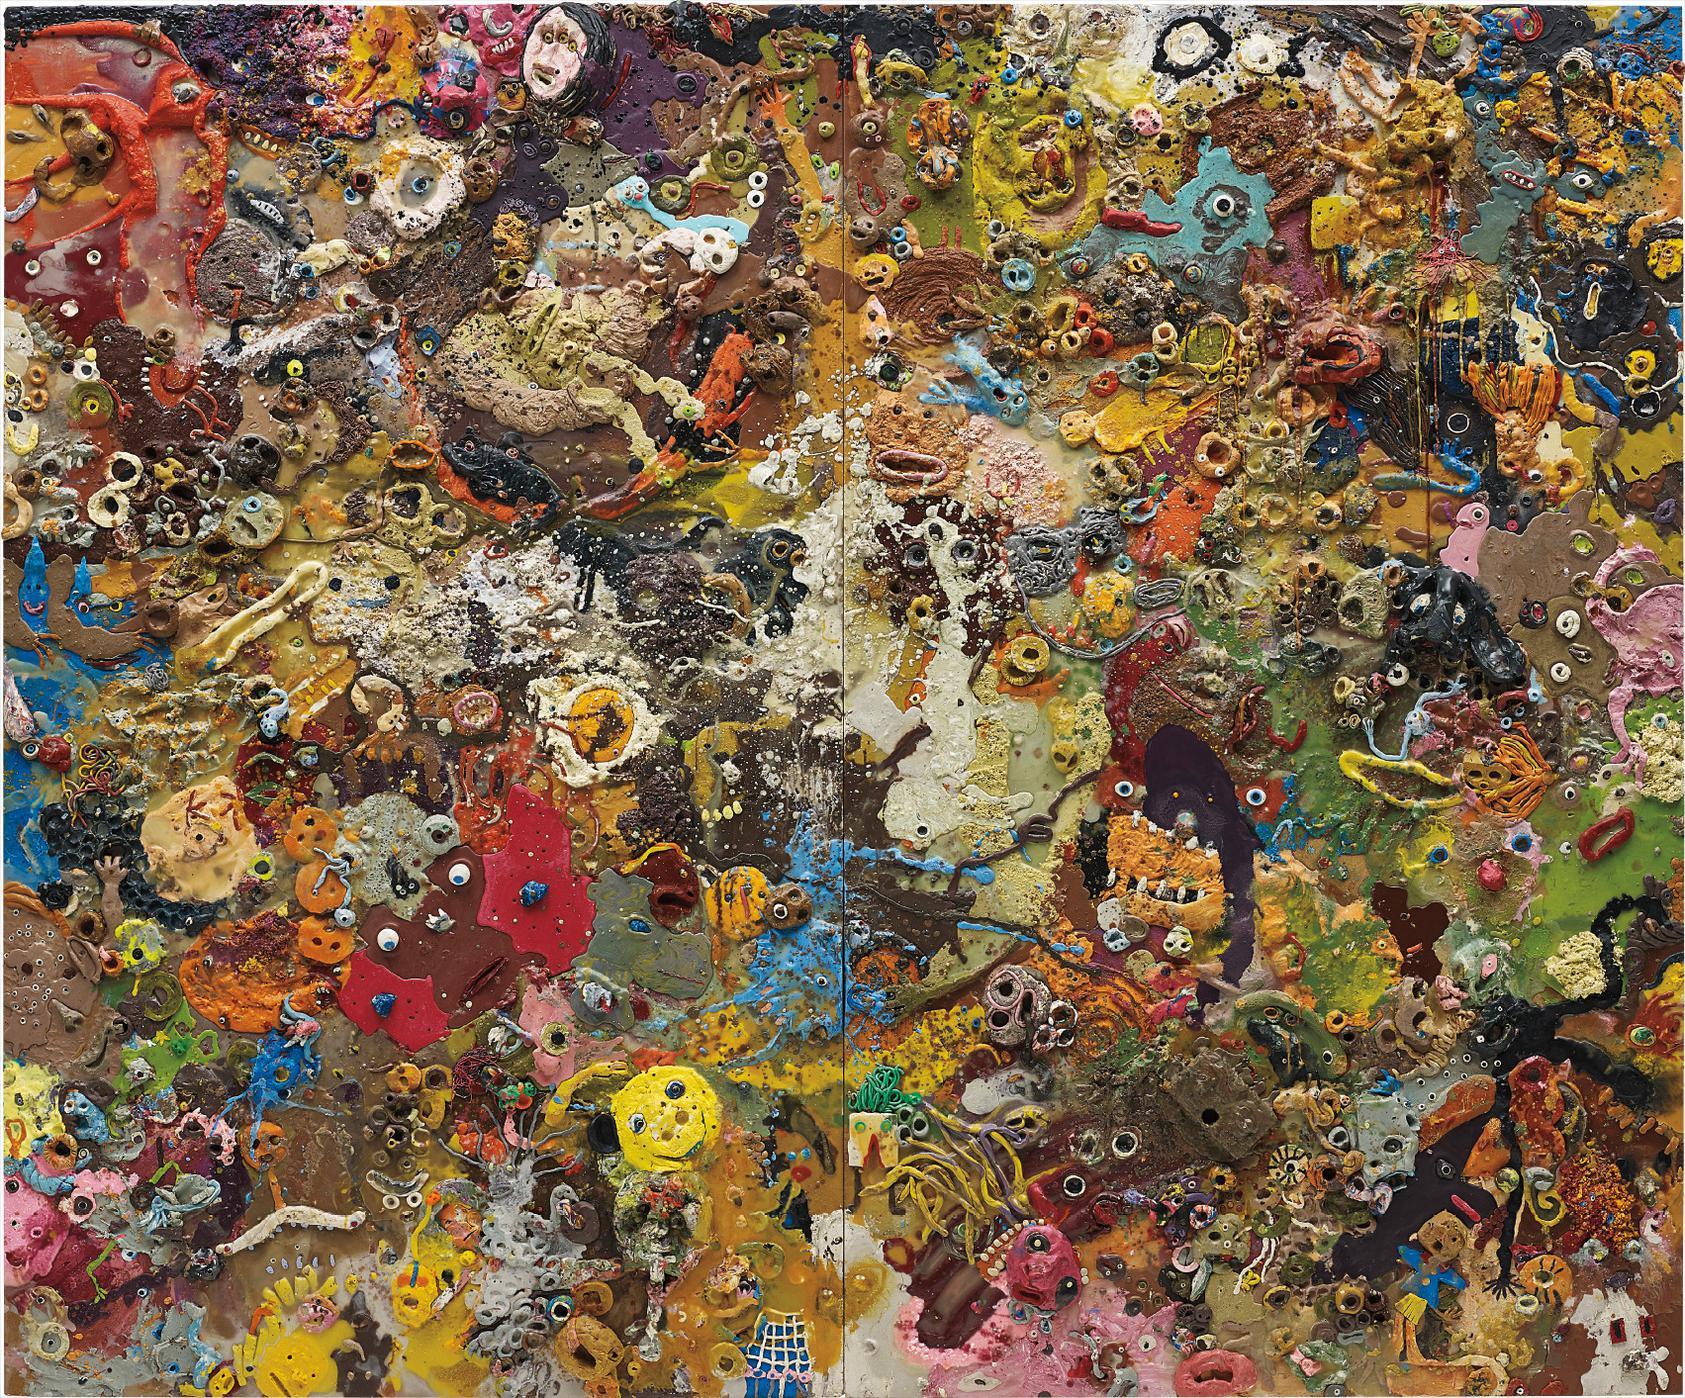 Gelitin-Untitled-2008